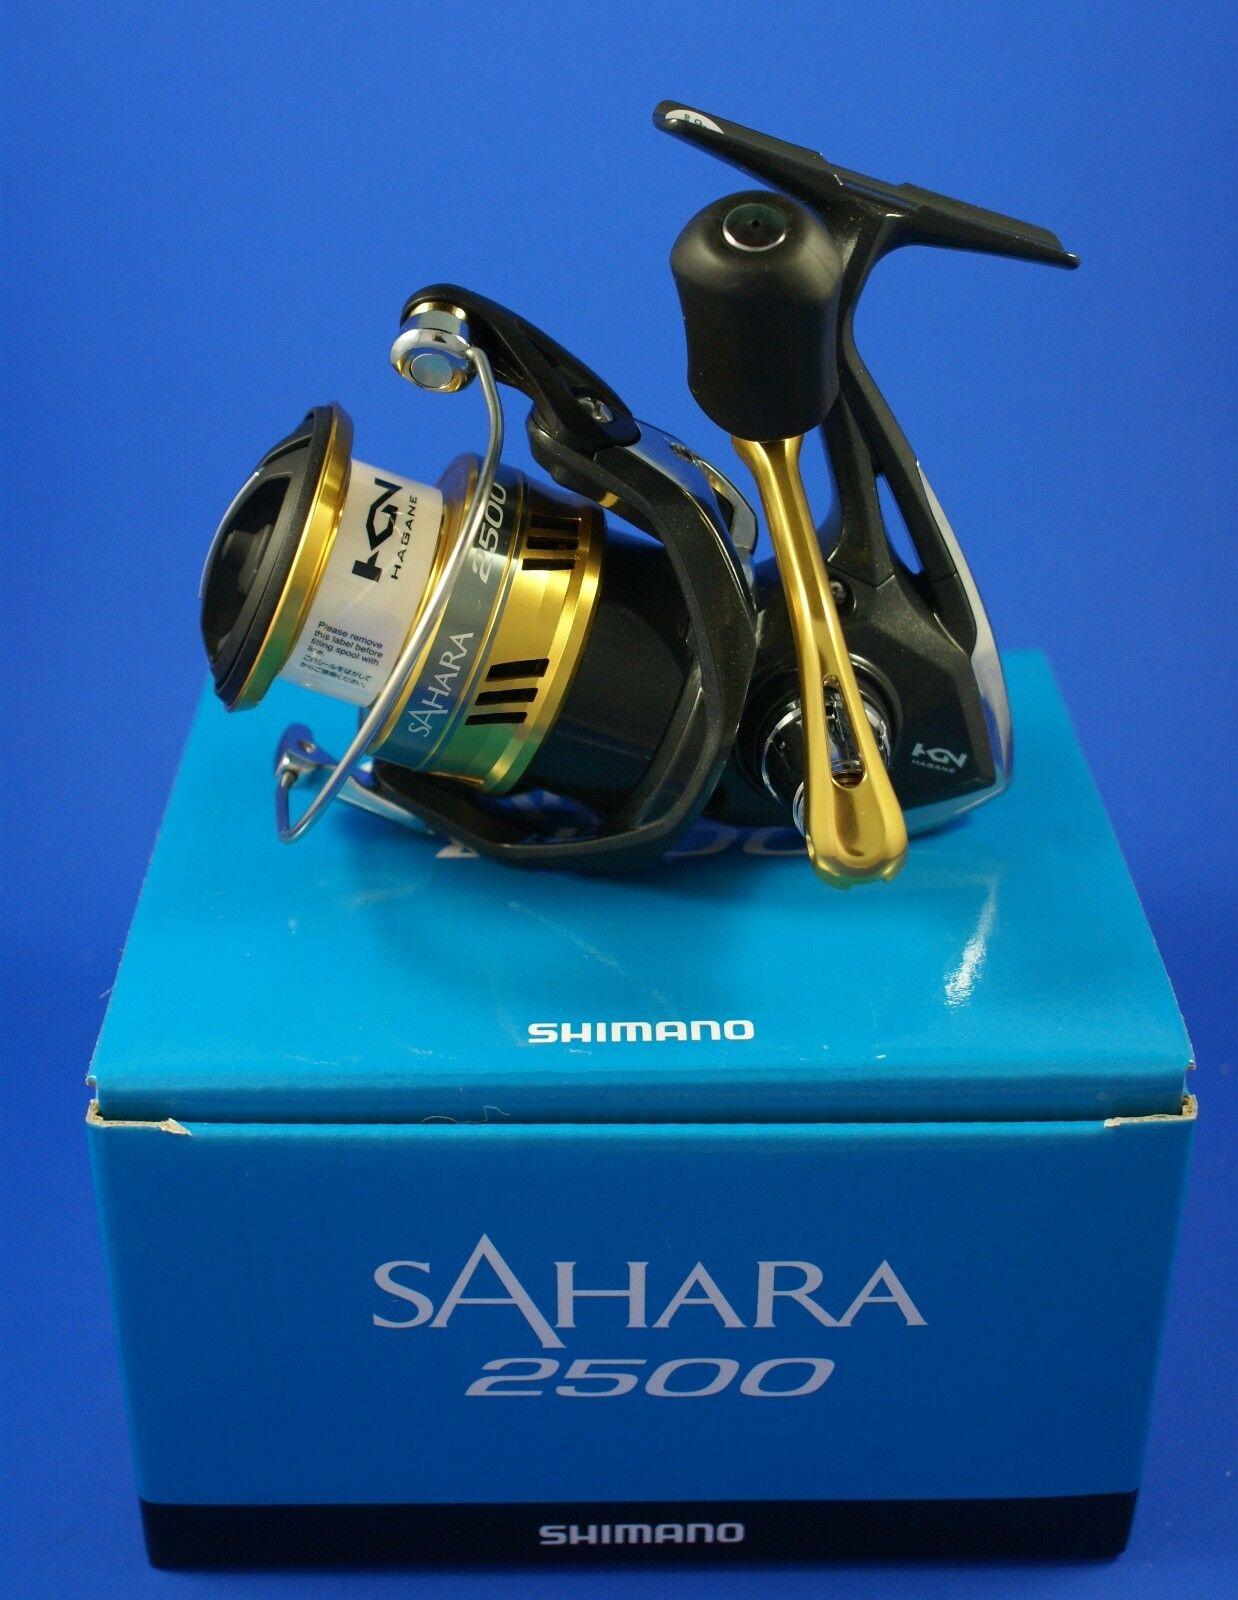 Shimano Sahara 2500 FI // SH2500FI // Front Drag Fishing Reel